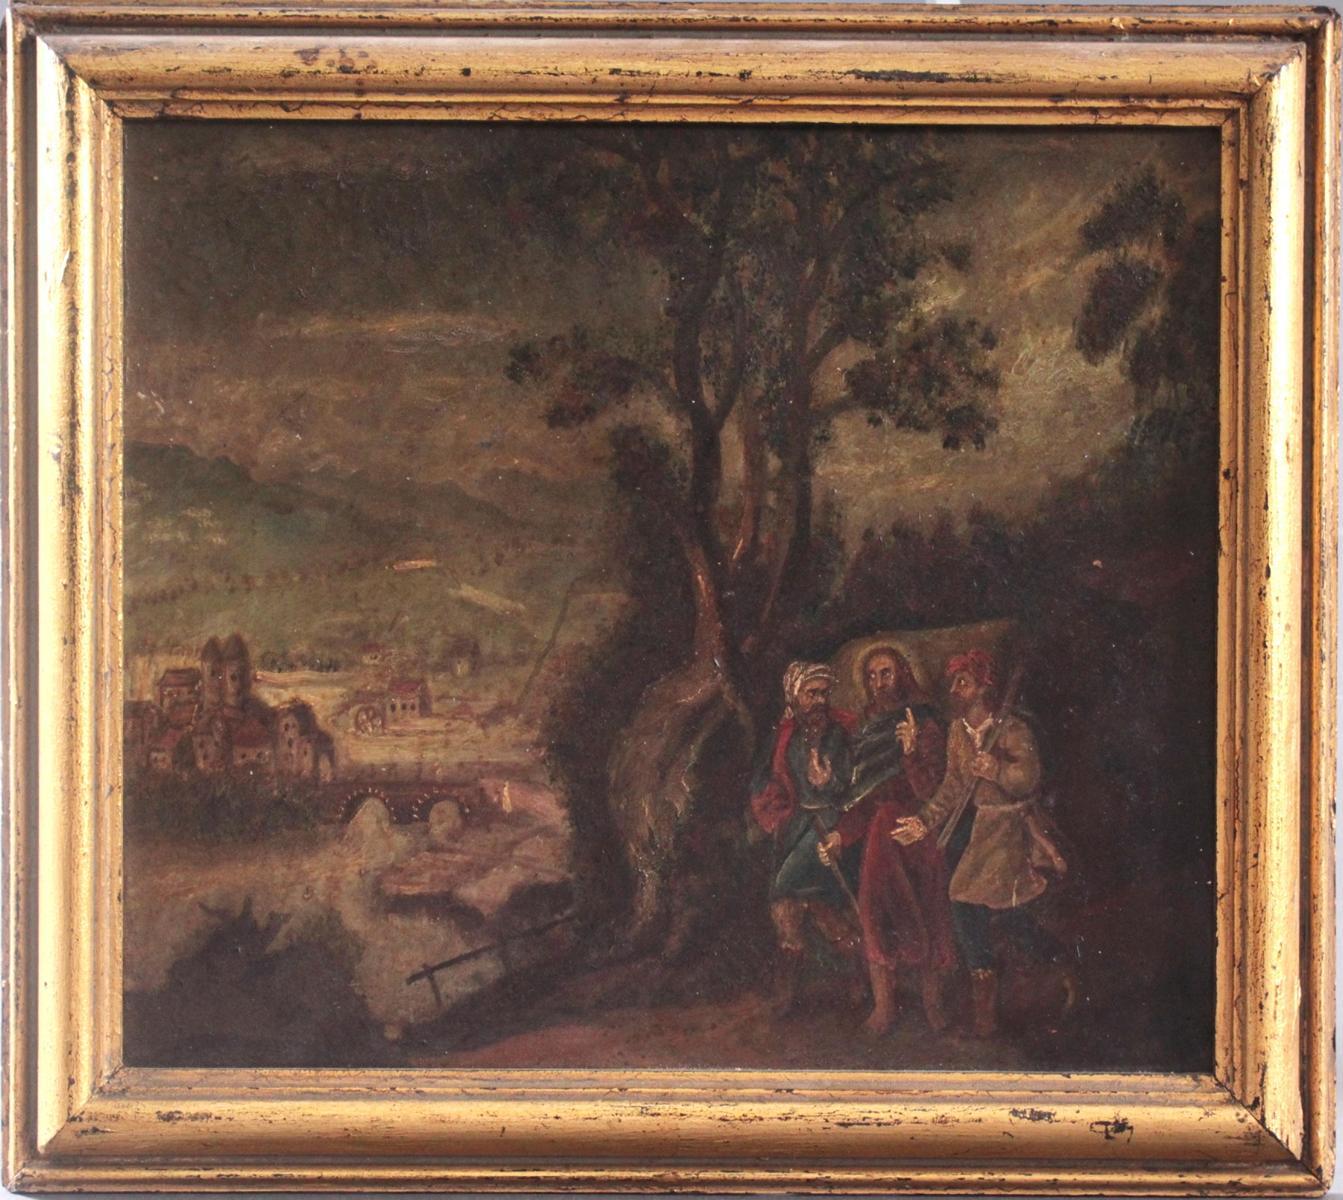 Religiöses Gemälde, 19. Jahrhundert. Unbekannter Künstler